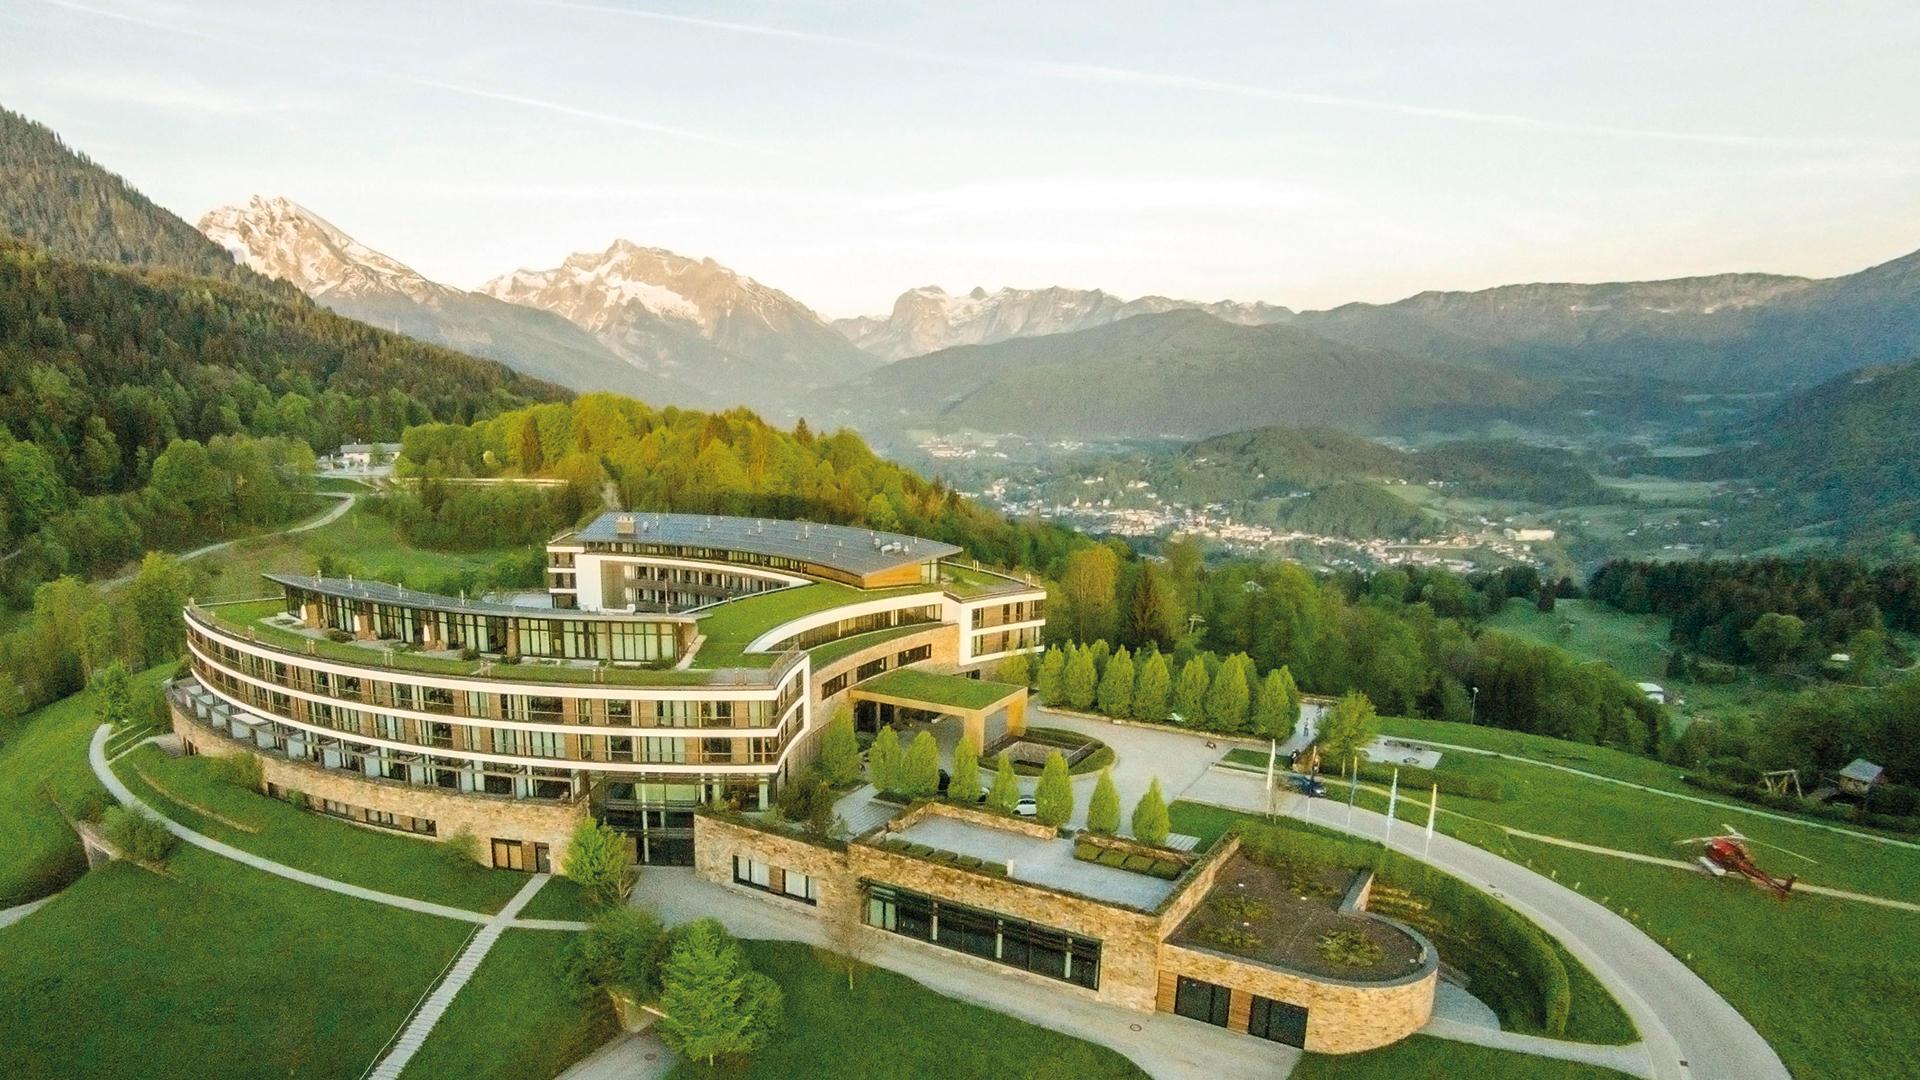 Kempinski Hotel Berchtesgaden.